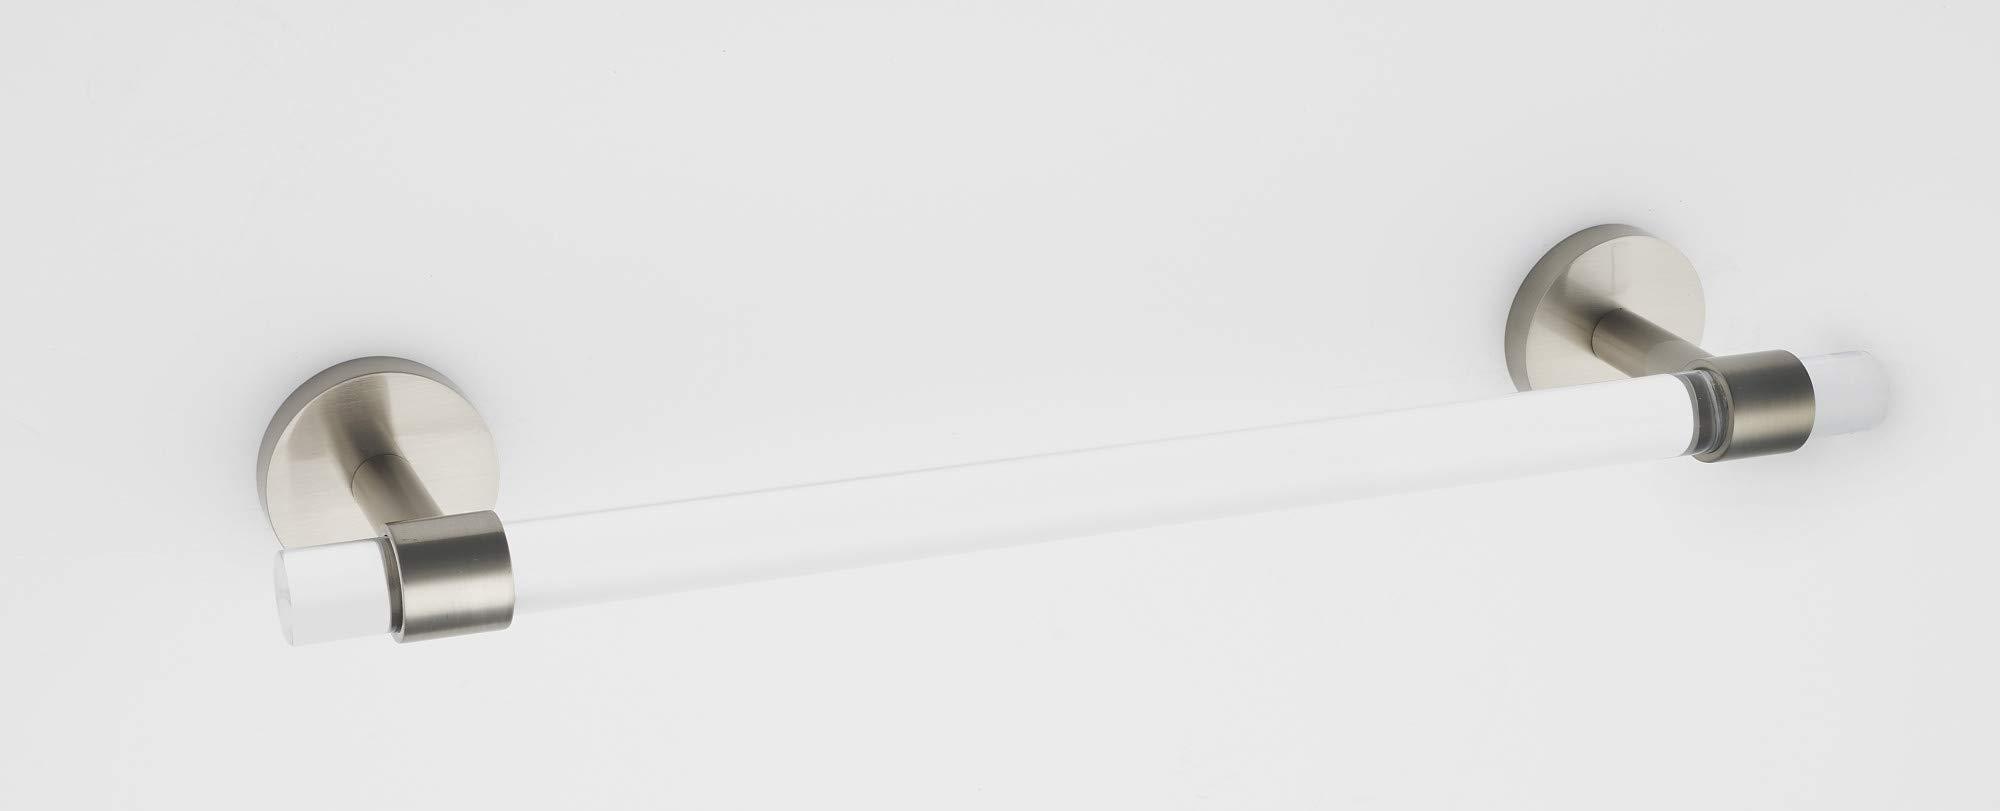 Alno A7220-24-SN Contemporary Acrylic 24 Inch Wide Towel Bar